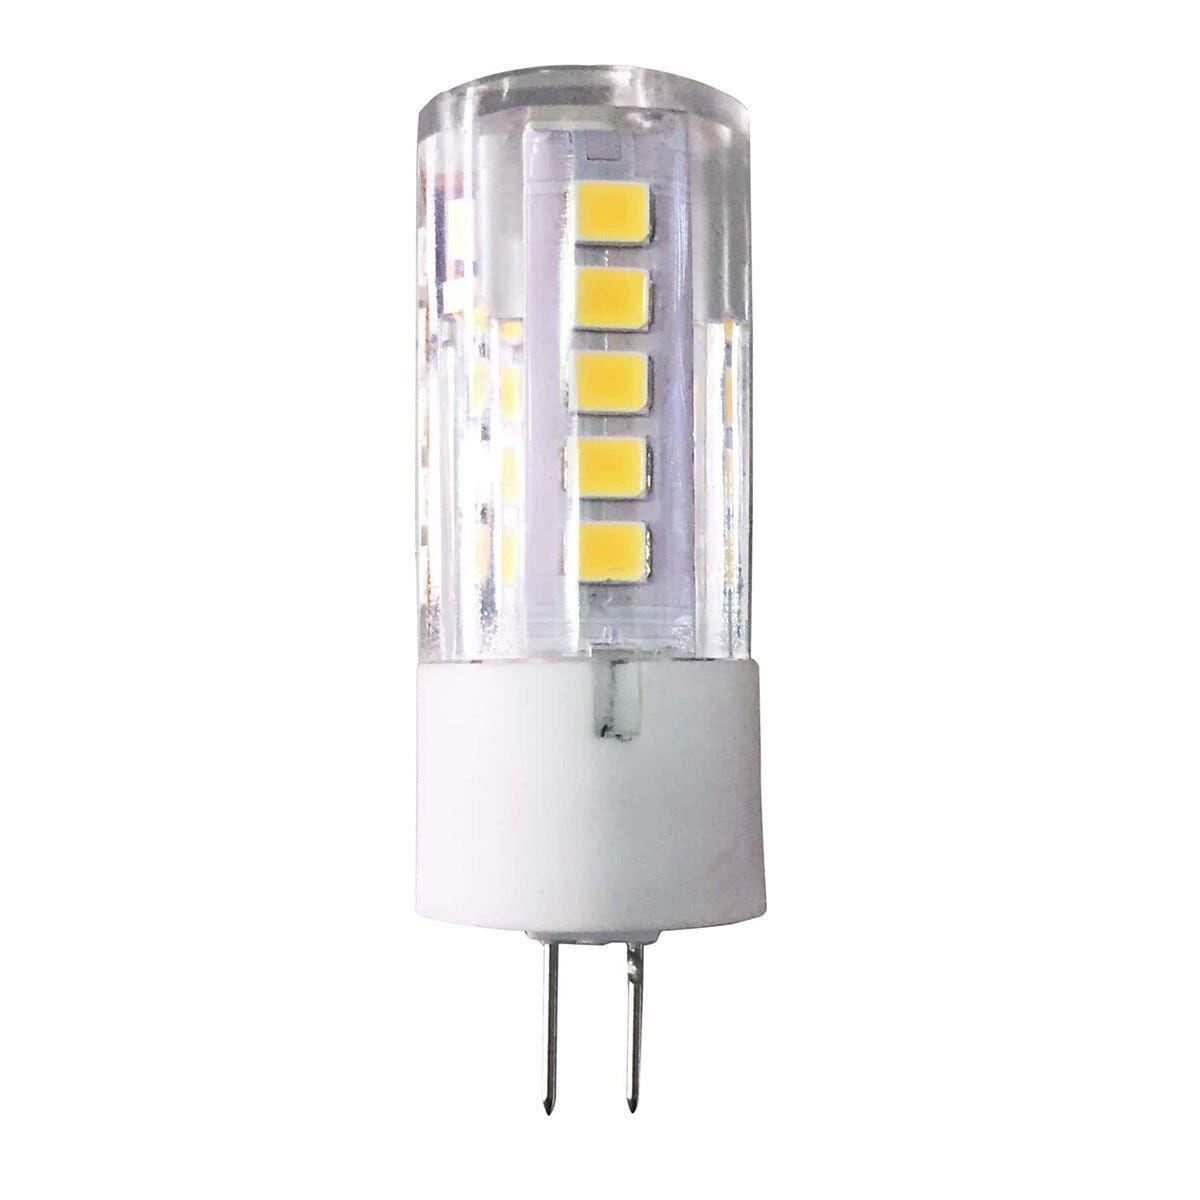 parko 2 lampadine  led mr11 g4 3w=25w 300 lumen 4000k luce bianca Ø 16x46 mm